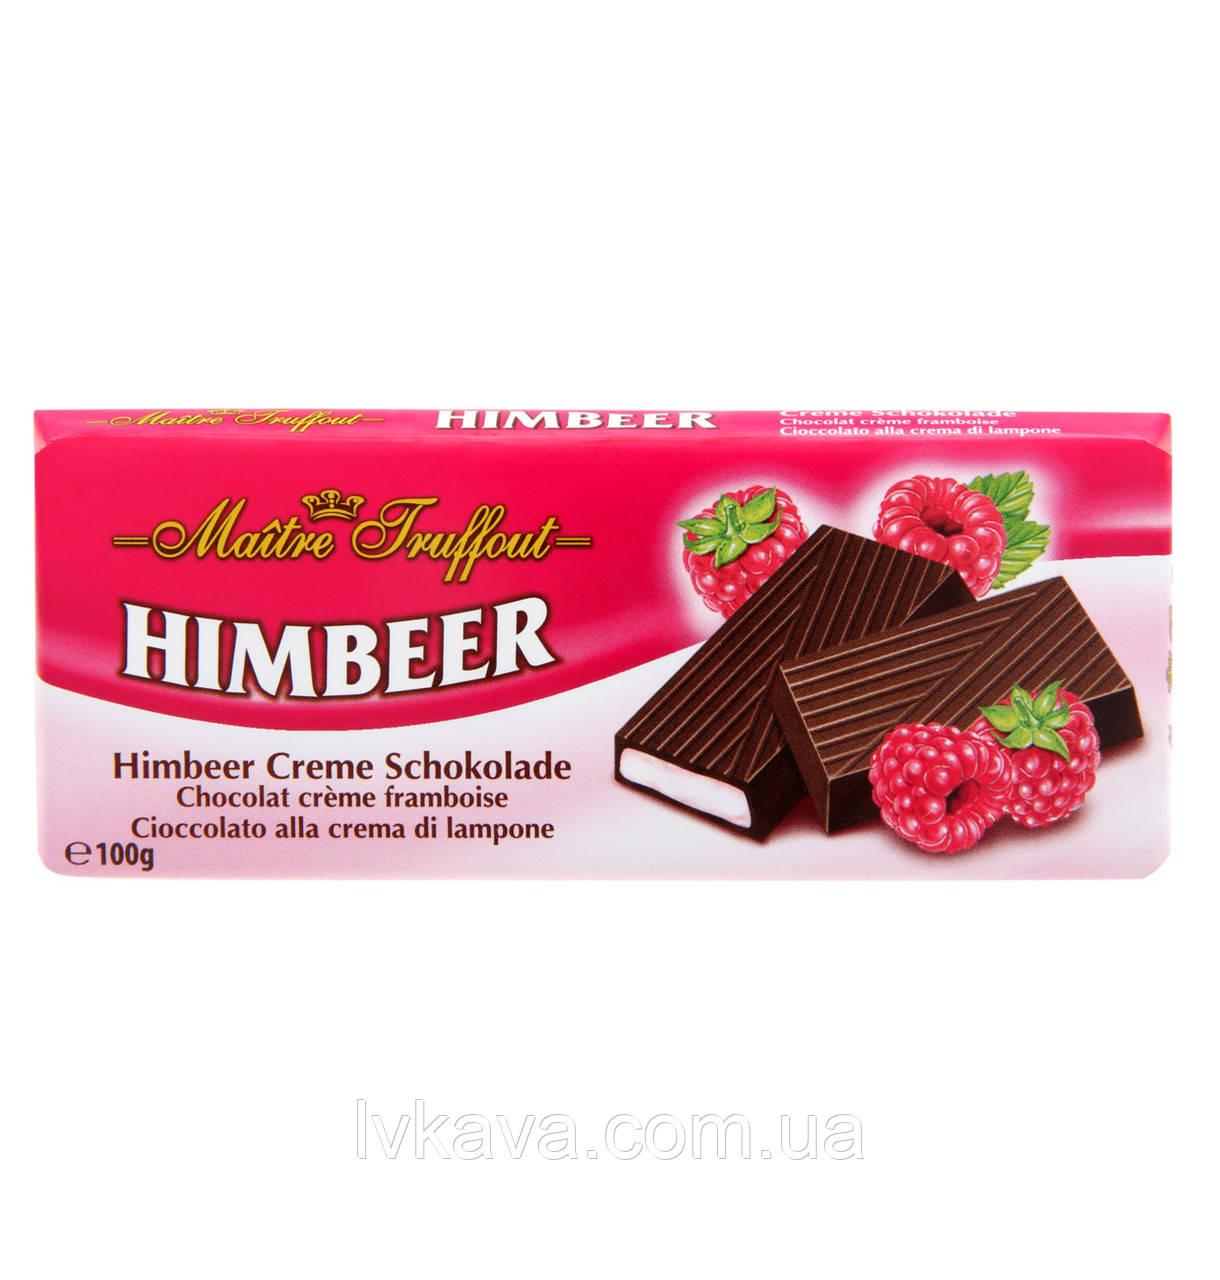 Черный шоколад Himbeer  Maitre Truffout  , 100 гр